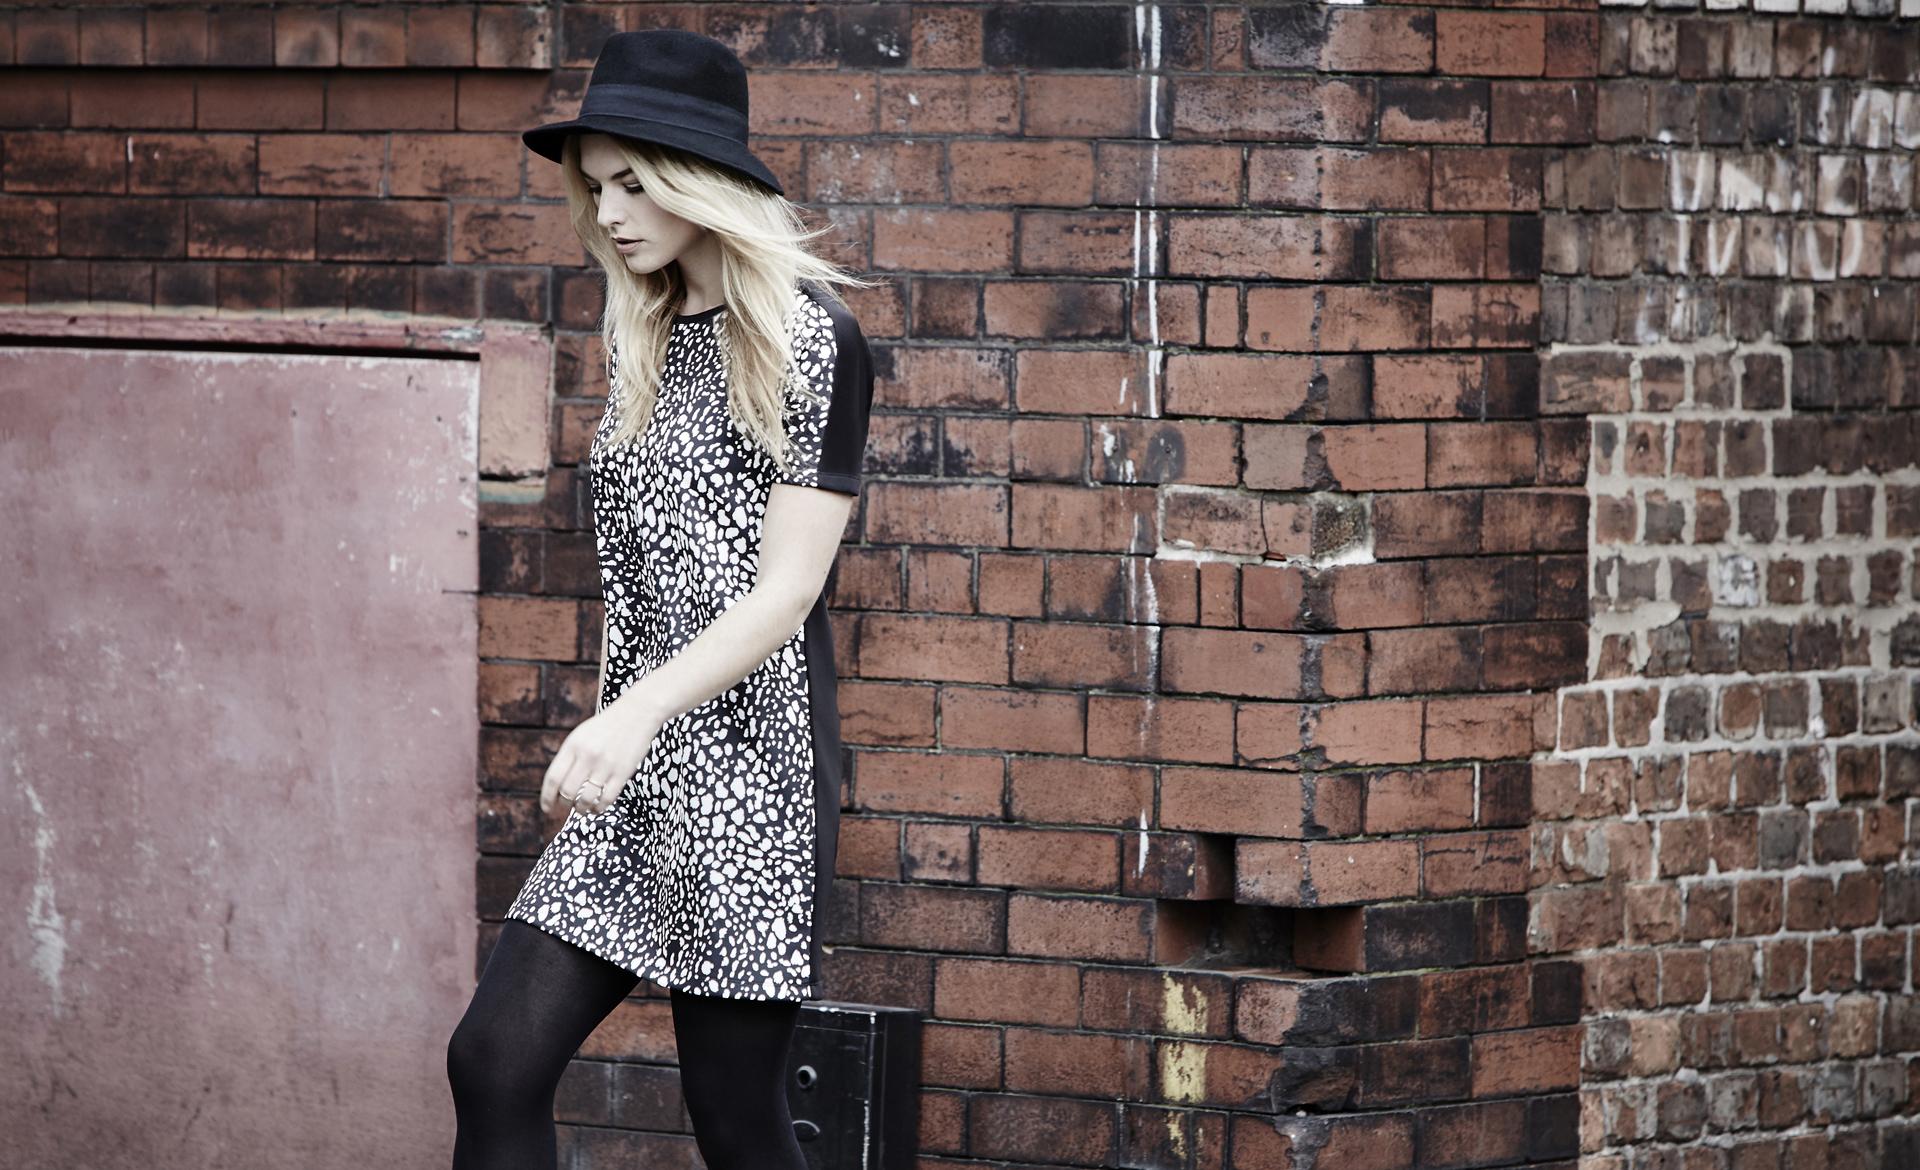 Women's Street Fashion Clothing